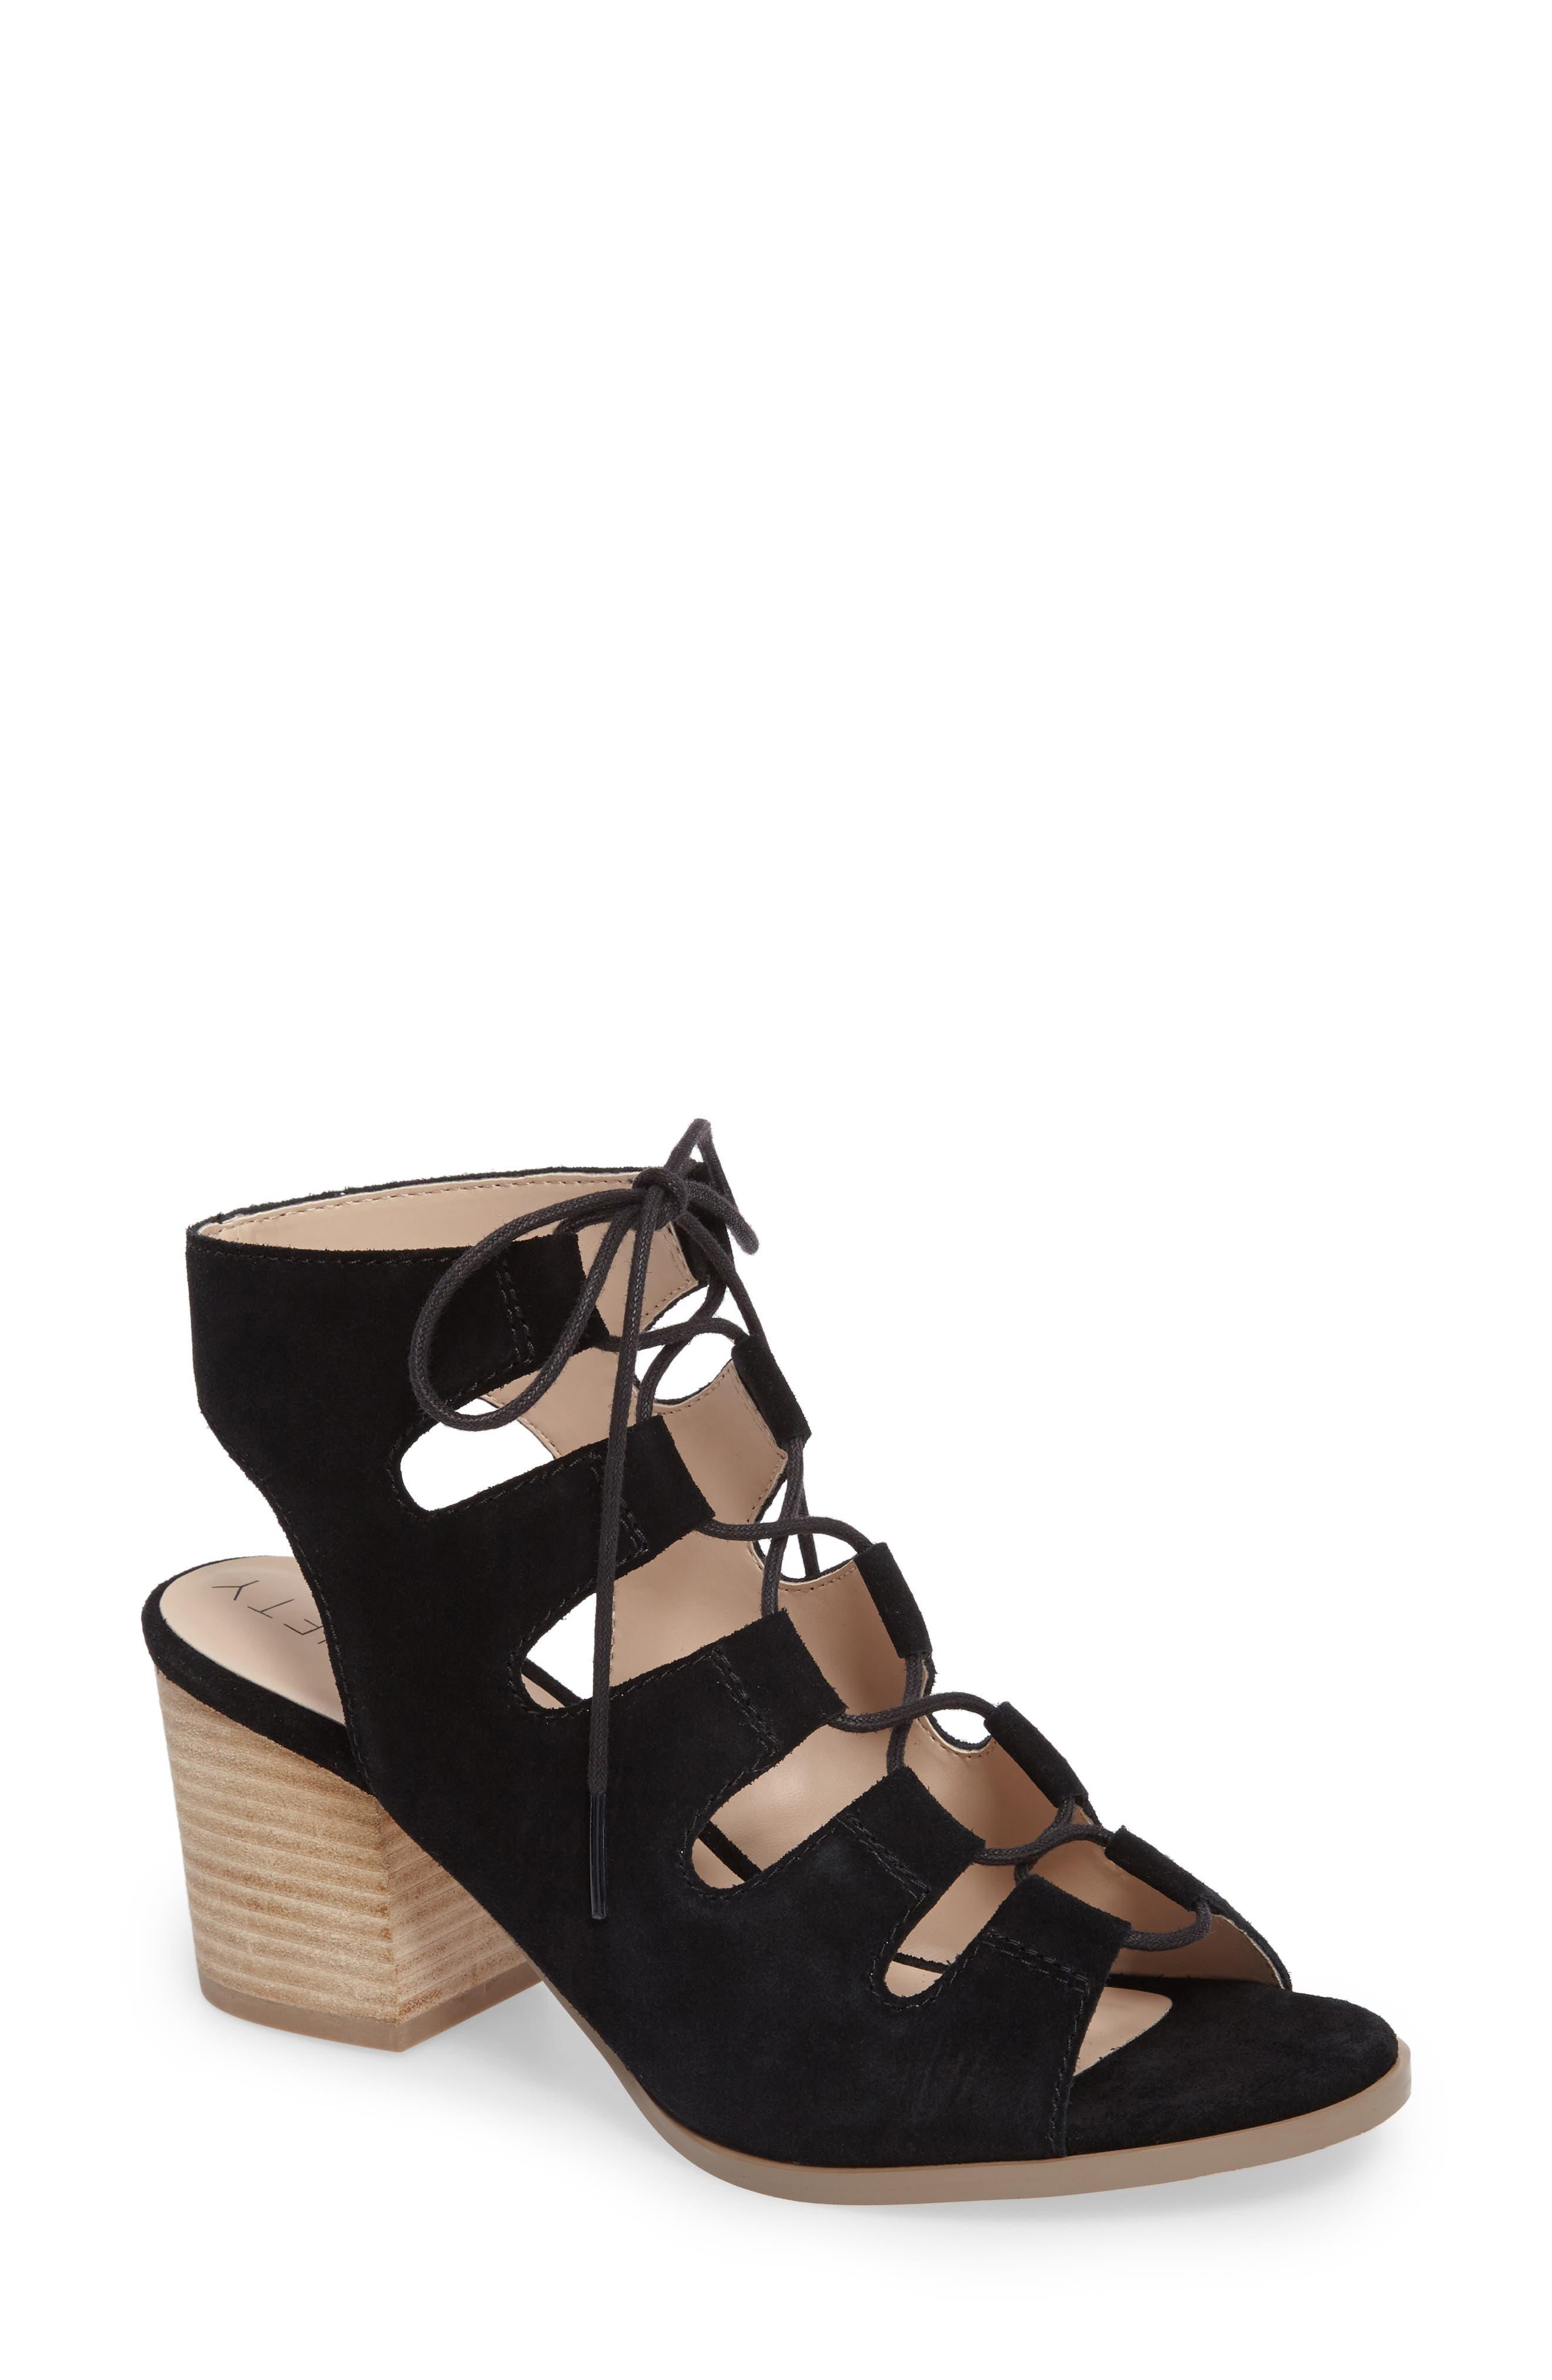 Rae Block Heel Sandal,                             Main thumbnail 1, color,                             003